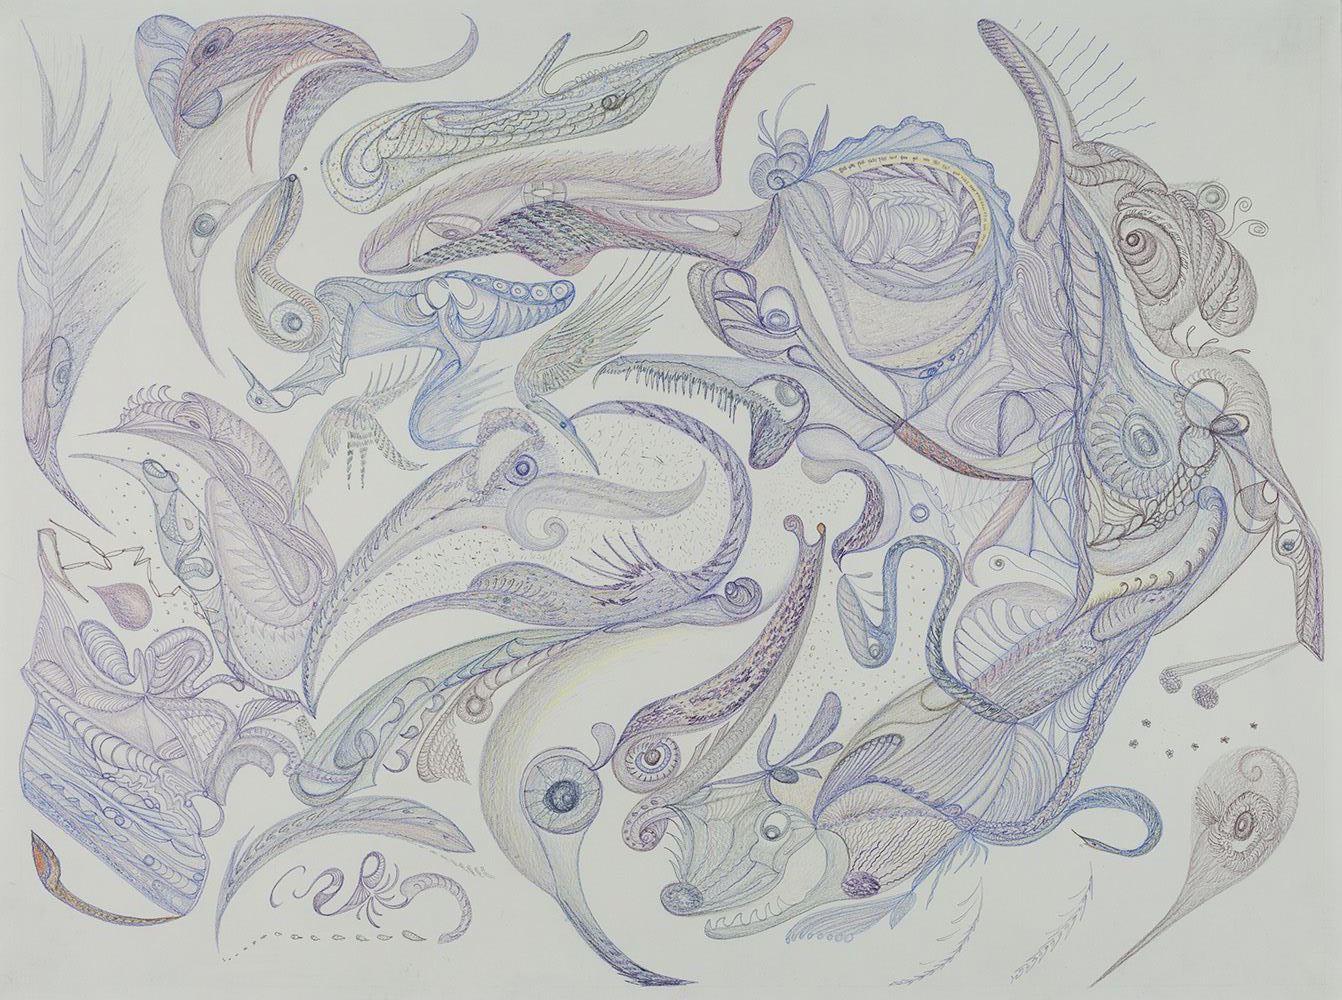 Zinnia Nishikawa    Untitled  , 2013-2015 Colored pencil on paper 18 x 24 inches 45.7 x 61 cm ZNi 1